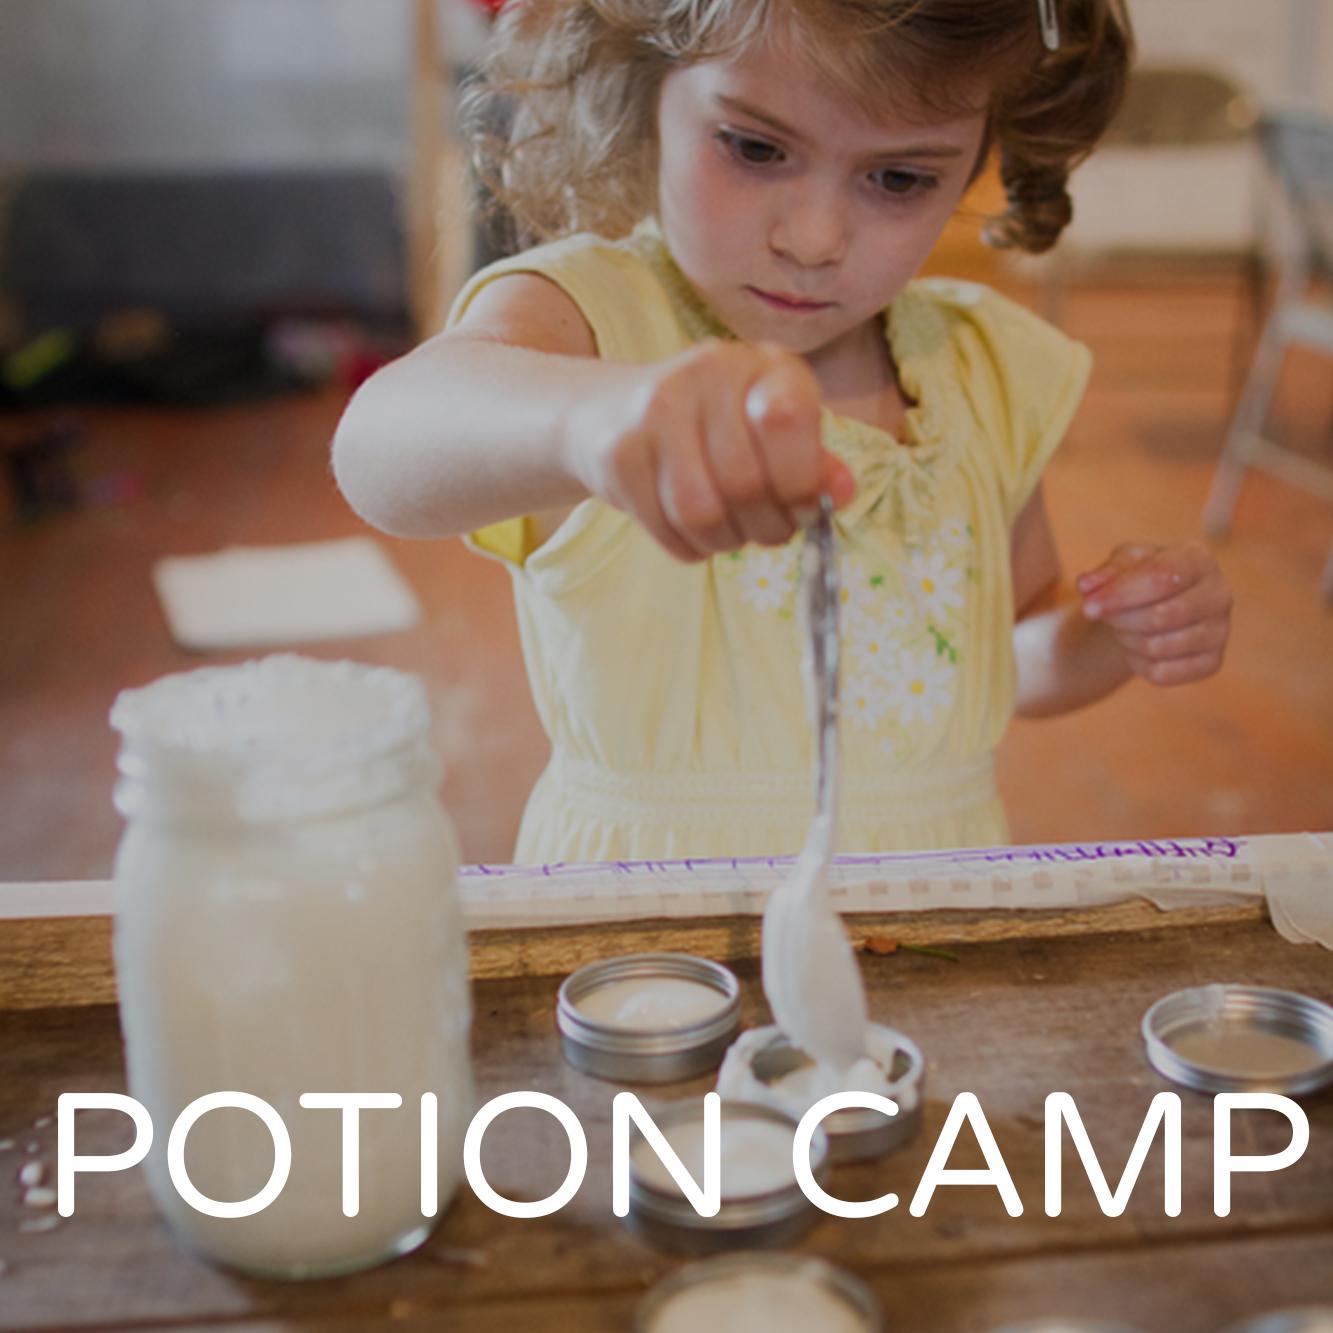 PotionCampPic2.jpg